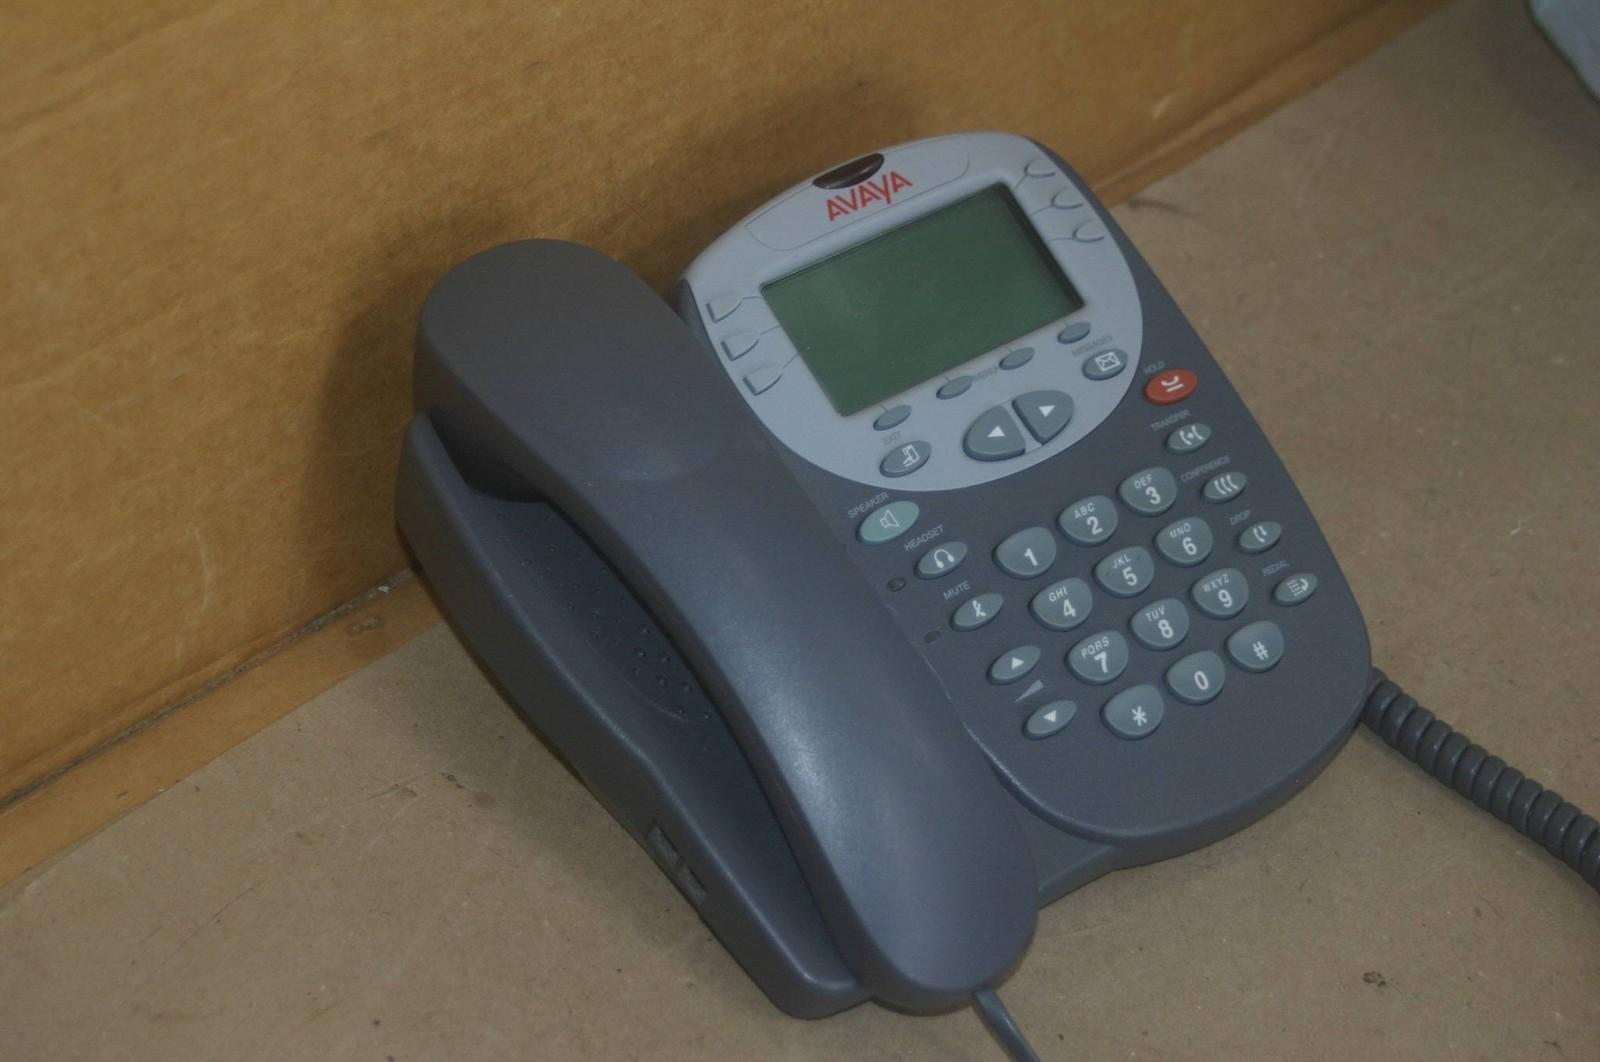 Avaya 5410 Digital Display Phone For Ip and 50 similar items